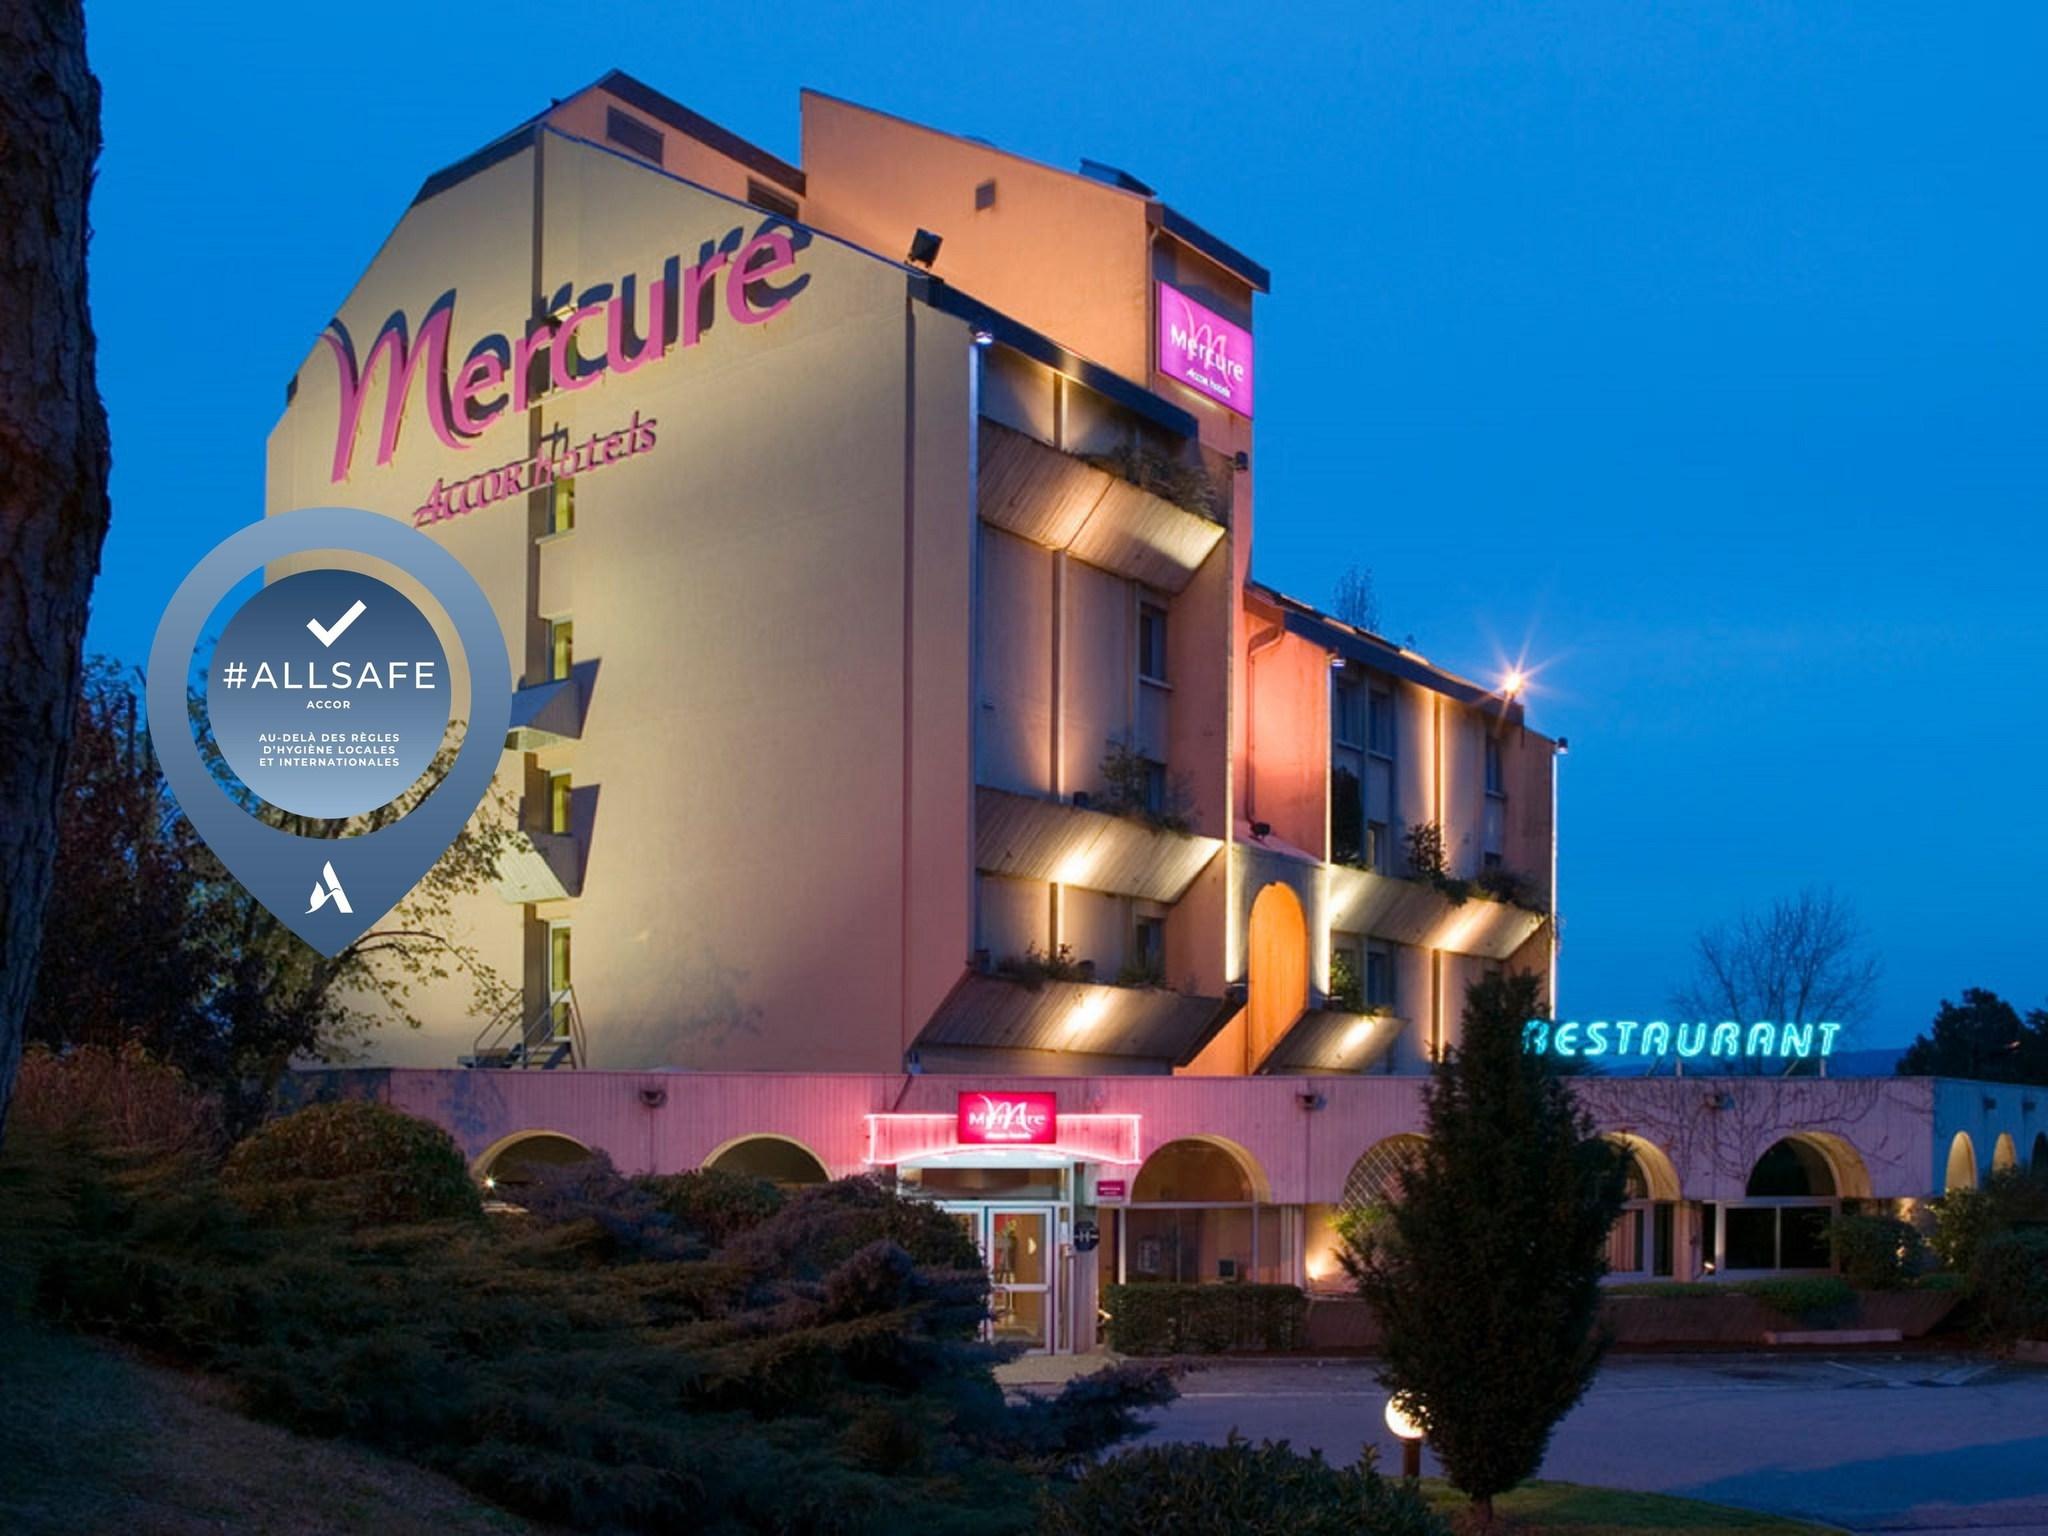 Hotel – Hotel Mercure Vienne Sud Chanas